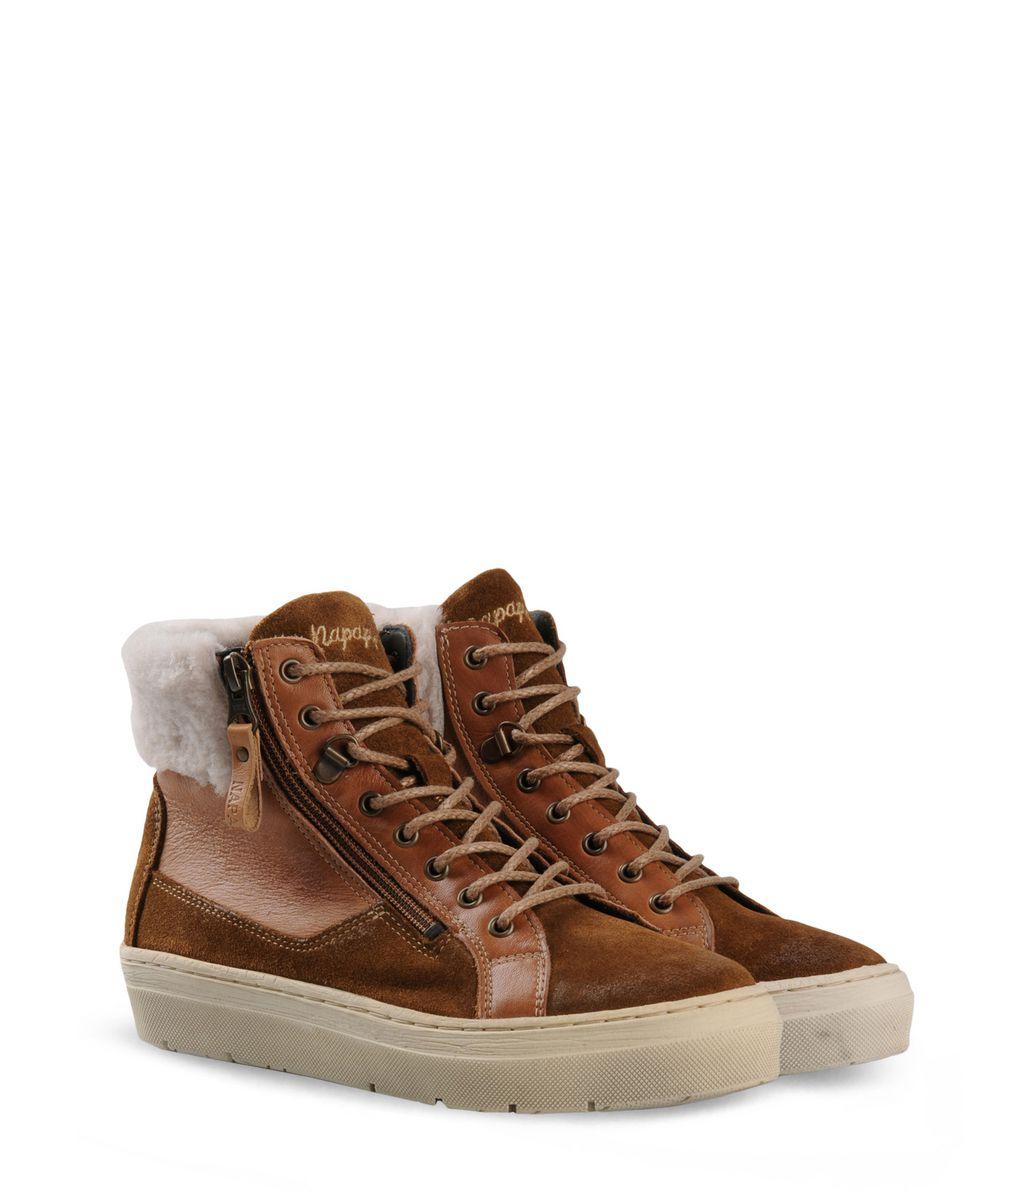 Chaussures Napapijiri marron femme bAHR1AqY50